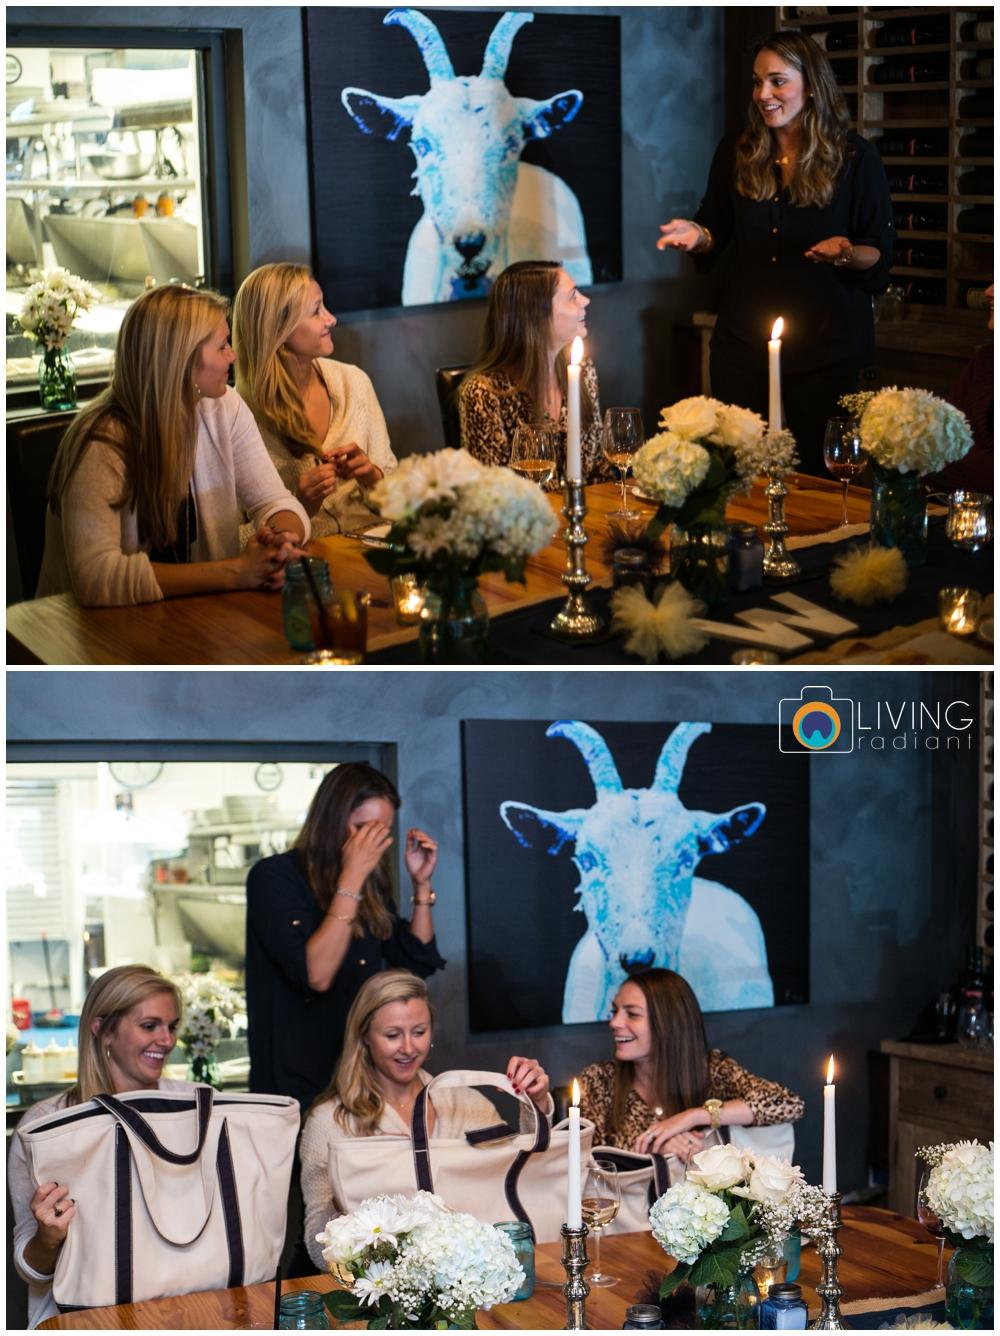 krissys-bridesmaid-luncheon-the-blue-goat-richmond-virginia-living-radiant-photography_0008.jpg